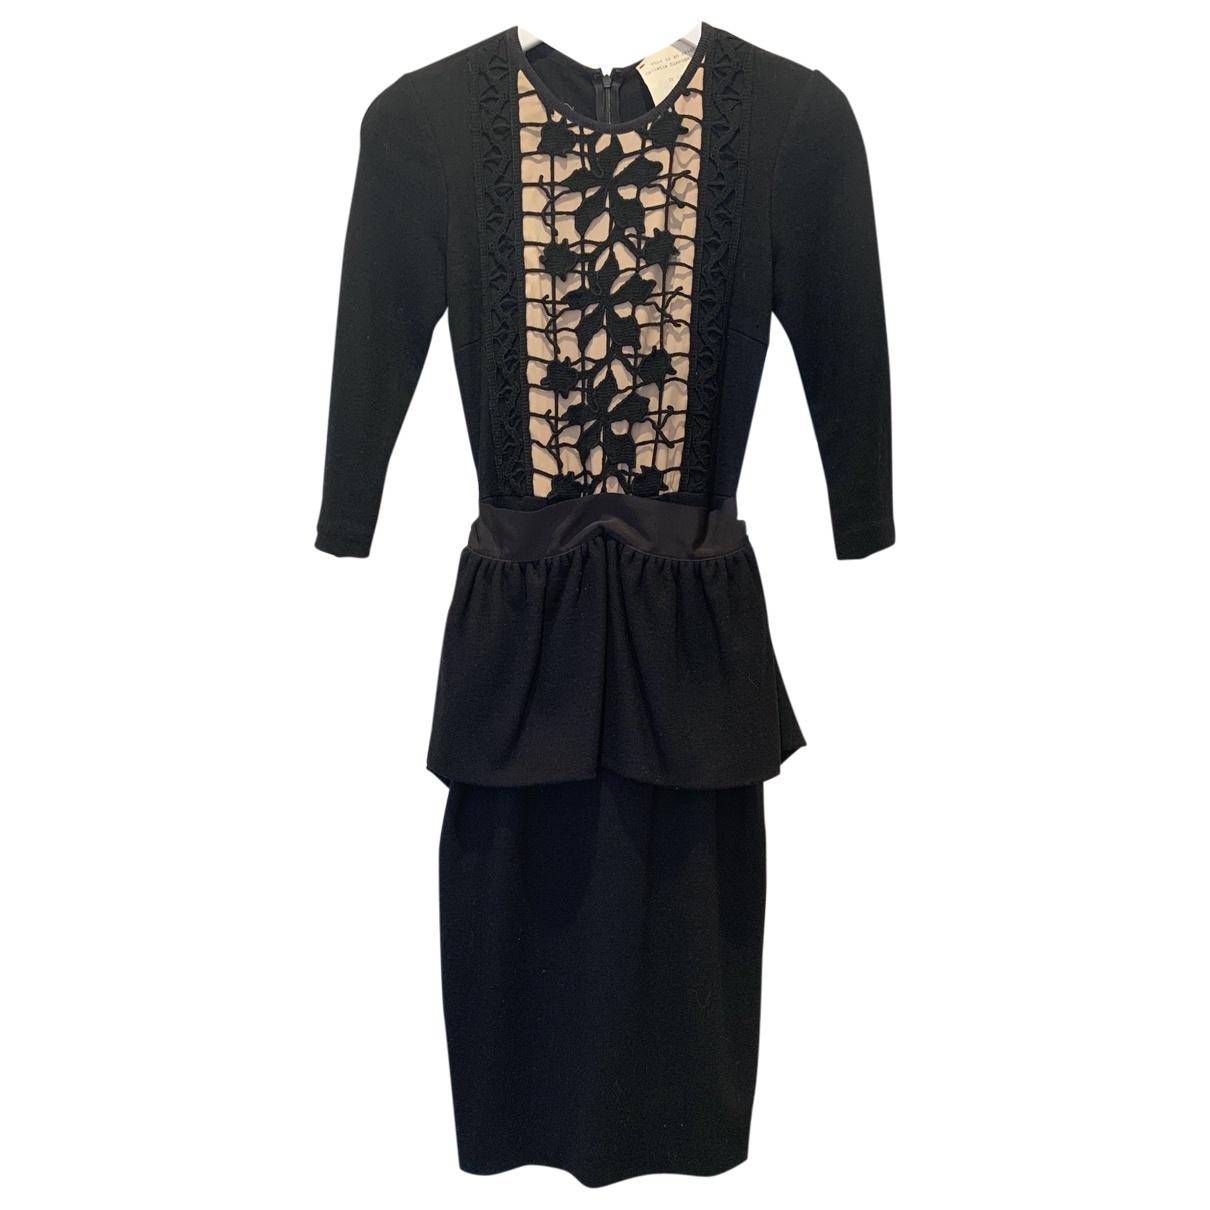 Collette Dinnigan \N Black Wool dress for Women 8 UK